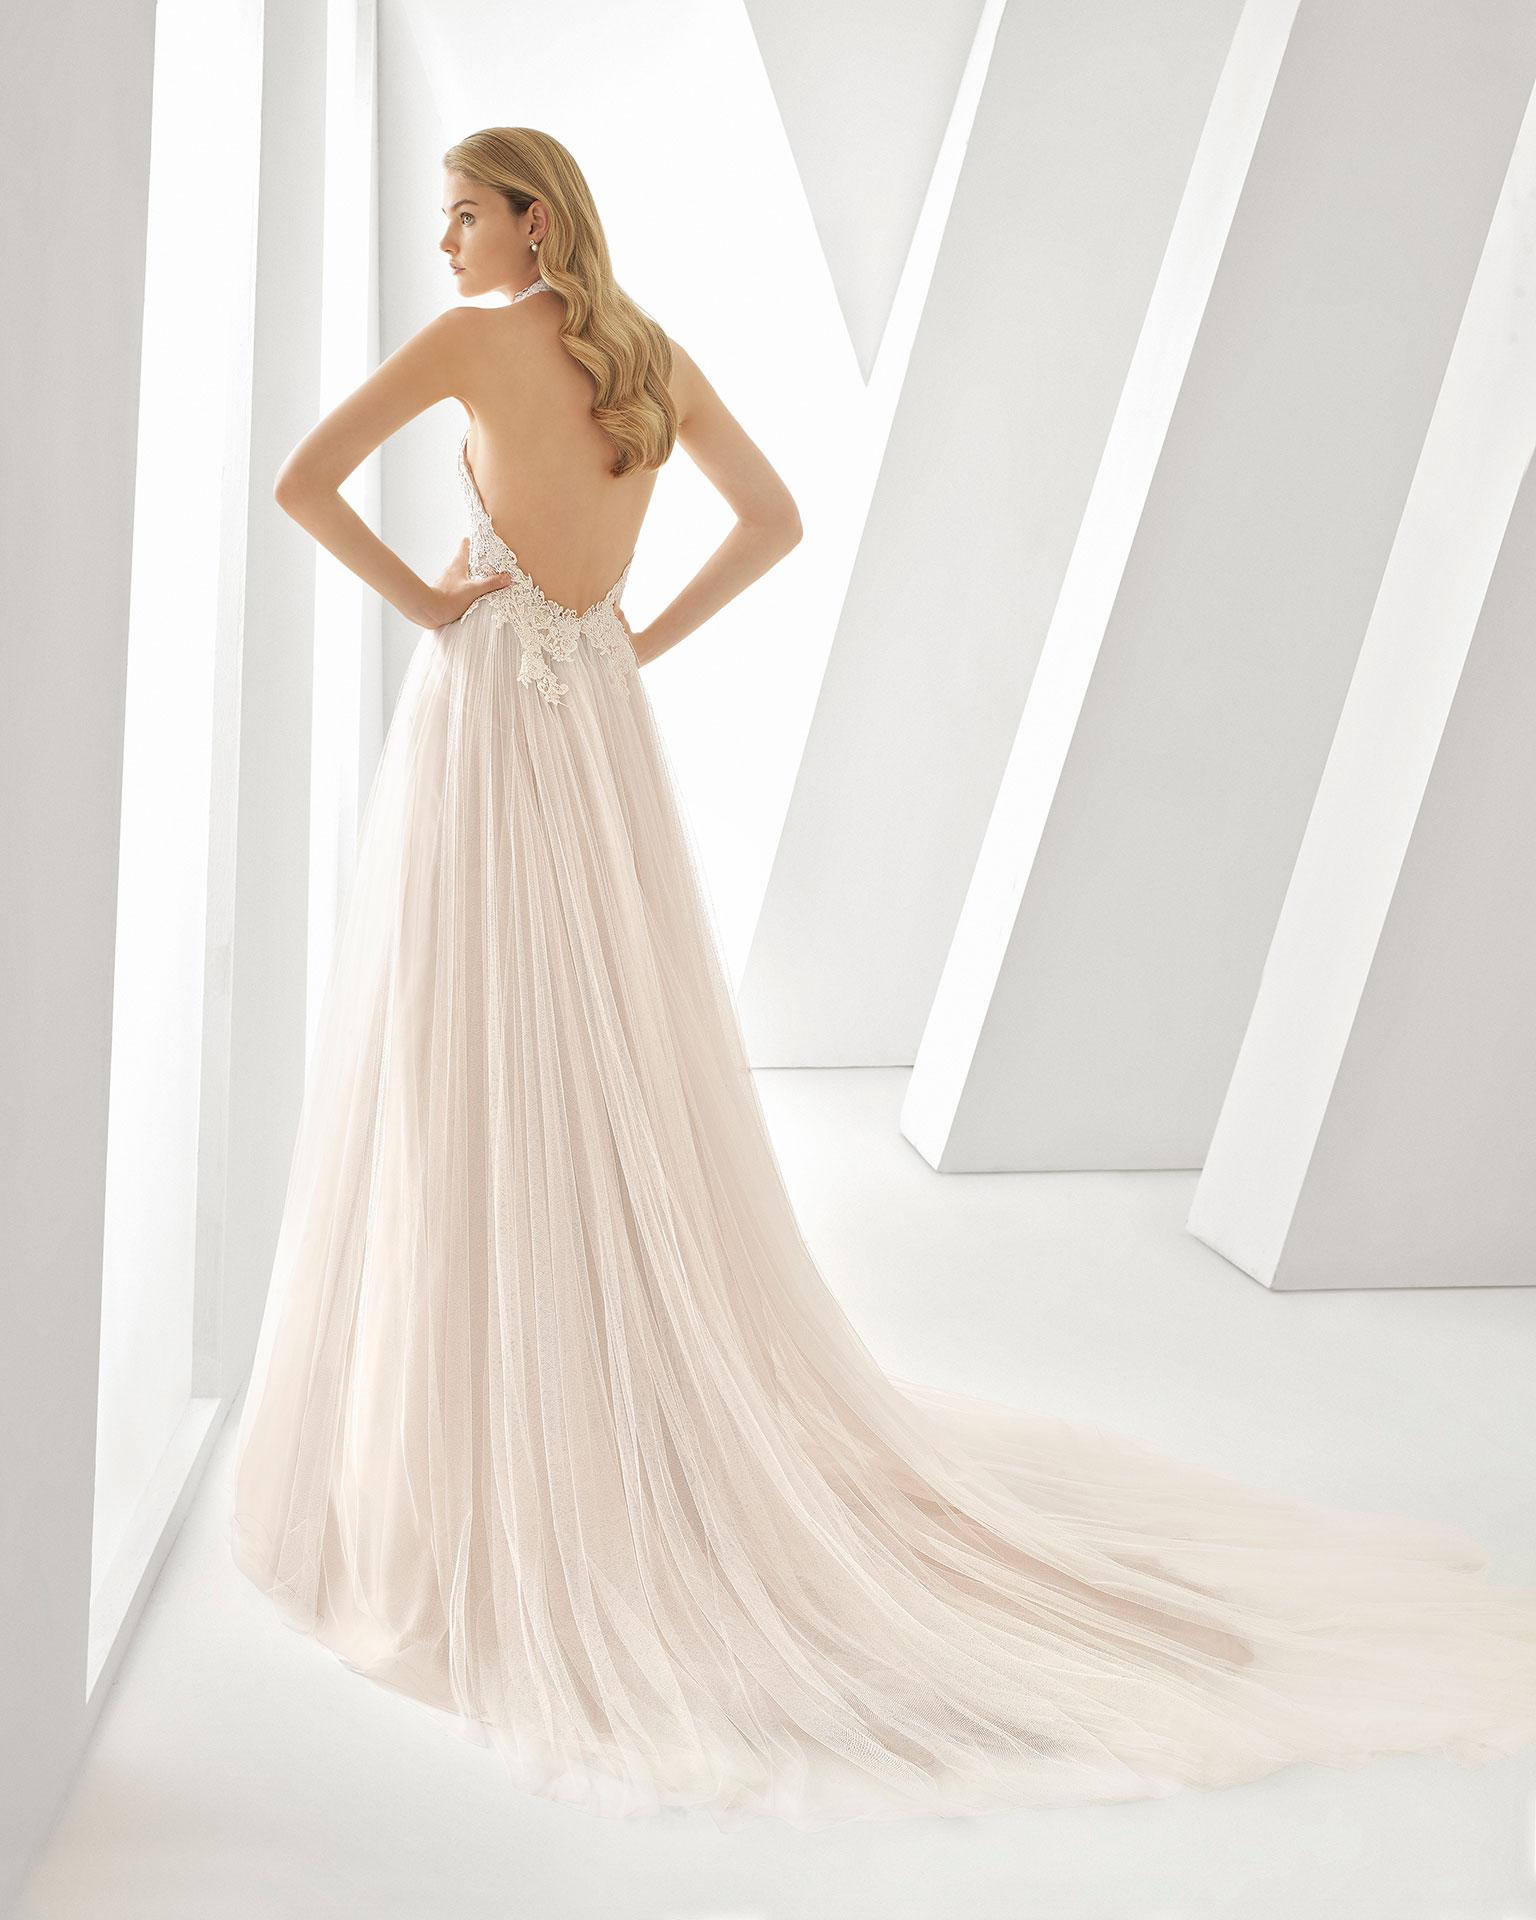 cccea377c0 DONATELA - Bridal 2019. ROSA CLARA Collection